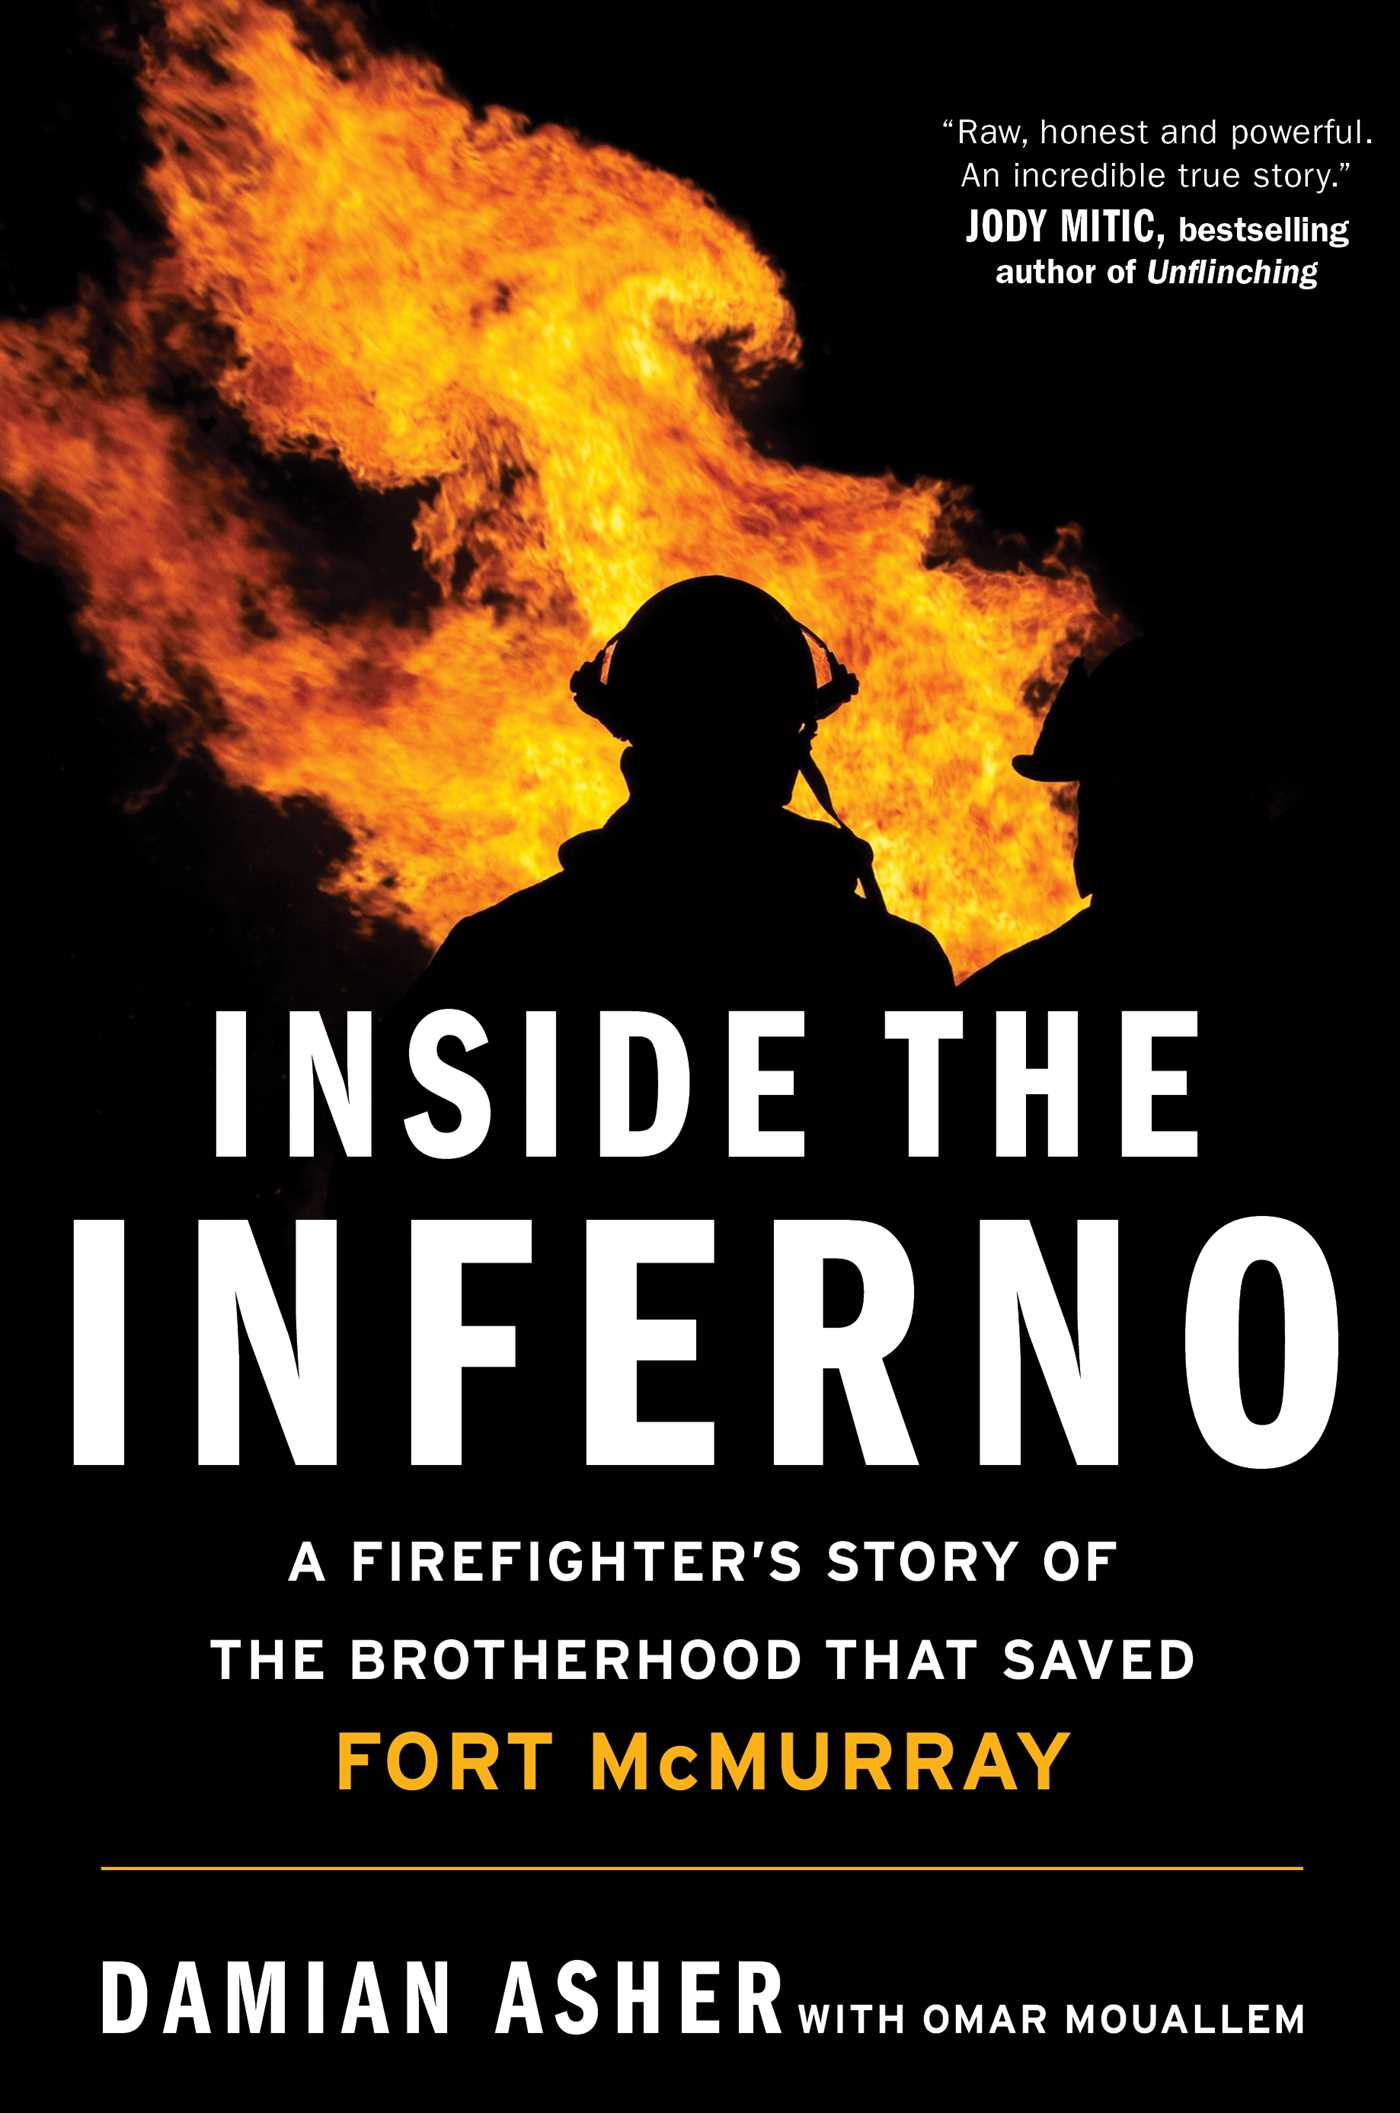 Inside the inferno 9781501171123 hr